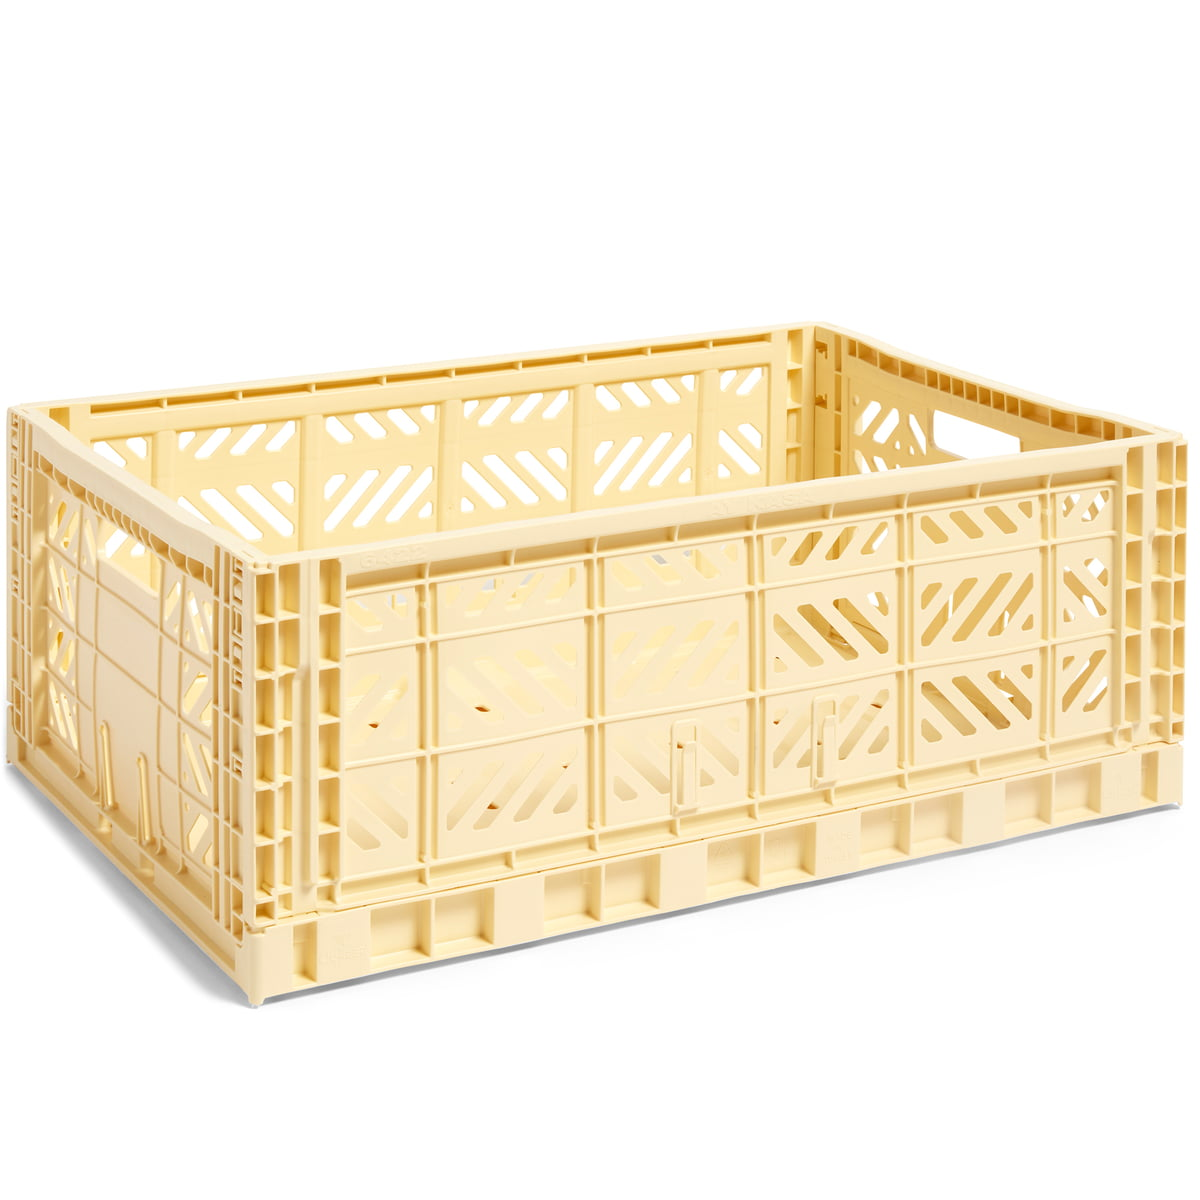 Hay colour crate korb l 60 x 40 cm hellgelb frei